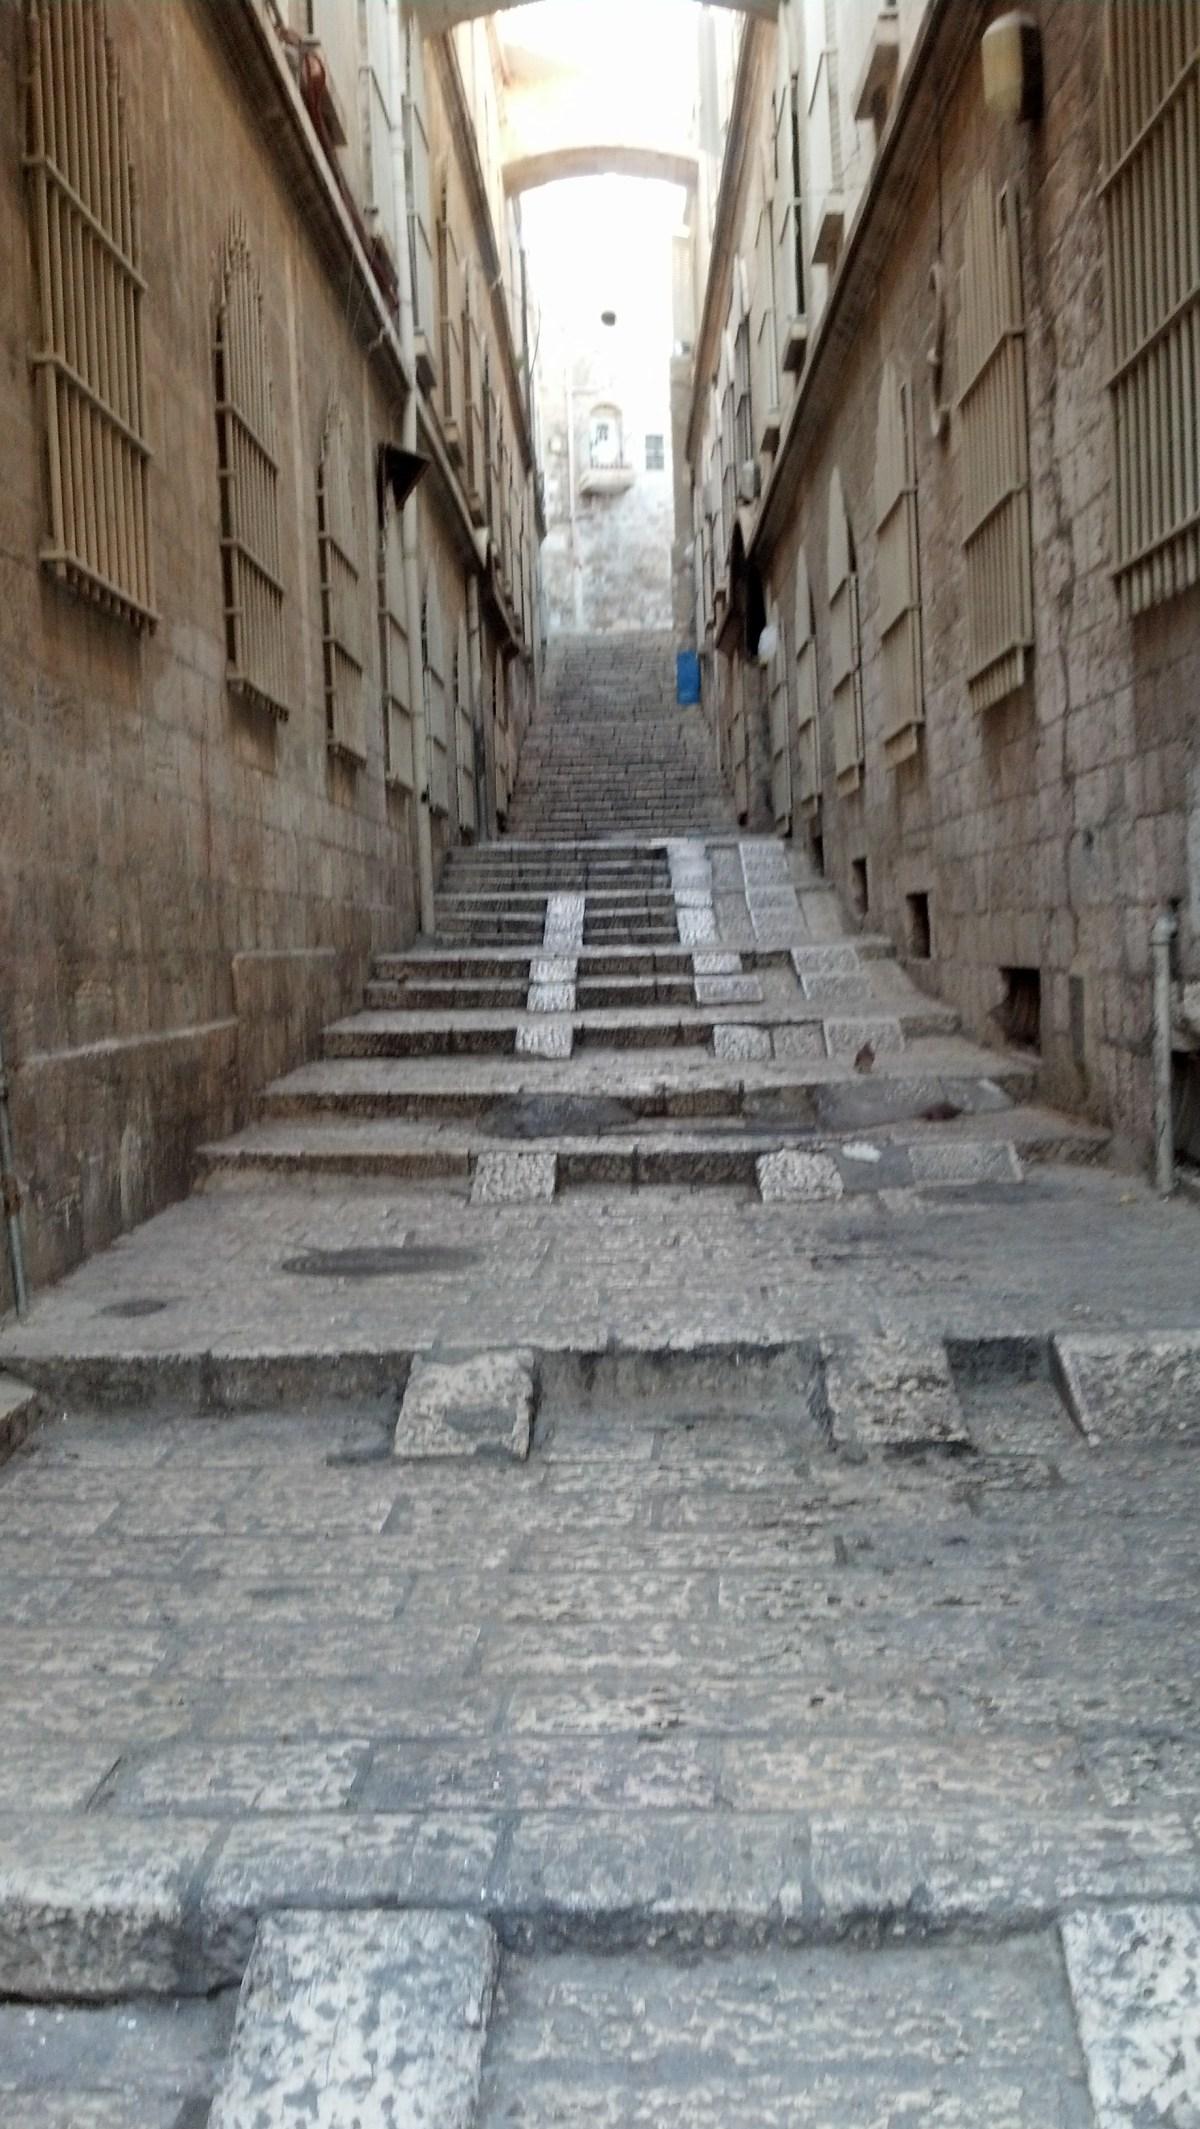 The Via Dolorosa in Jerusalem, Israel: Photo Gallery